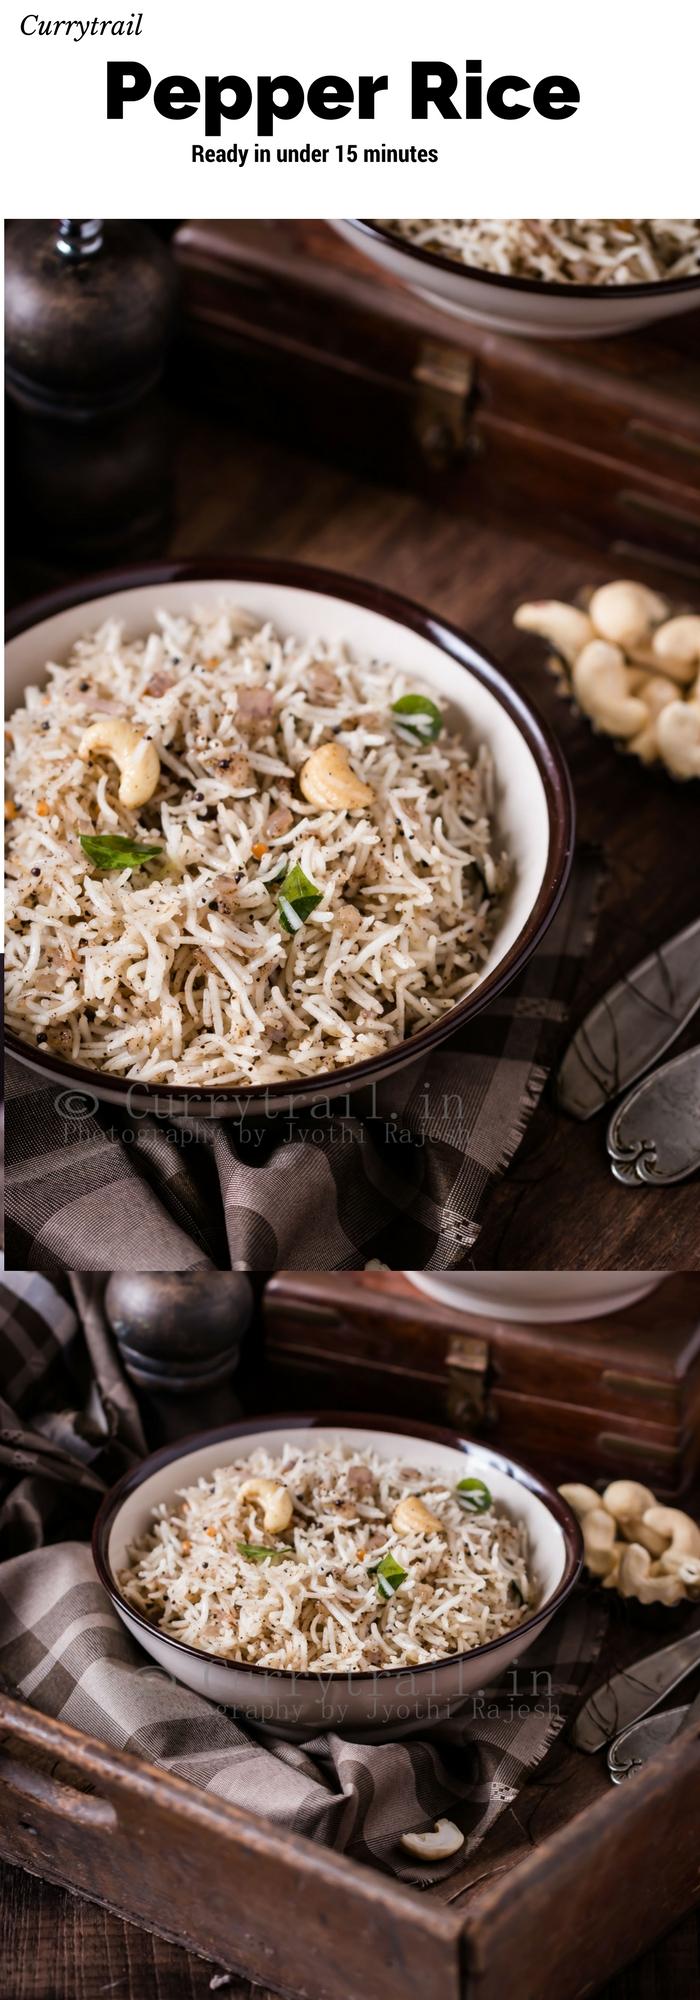 Currytrail (13)